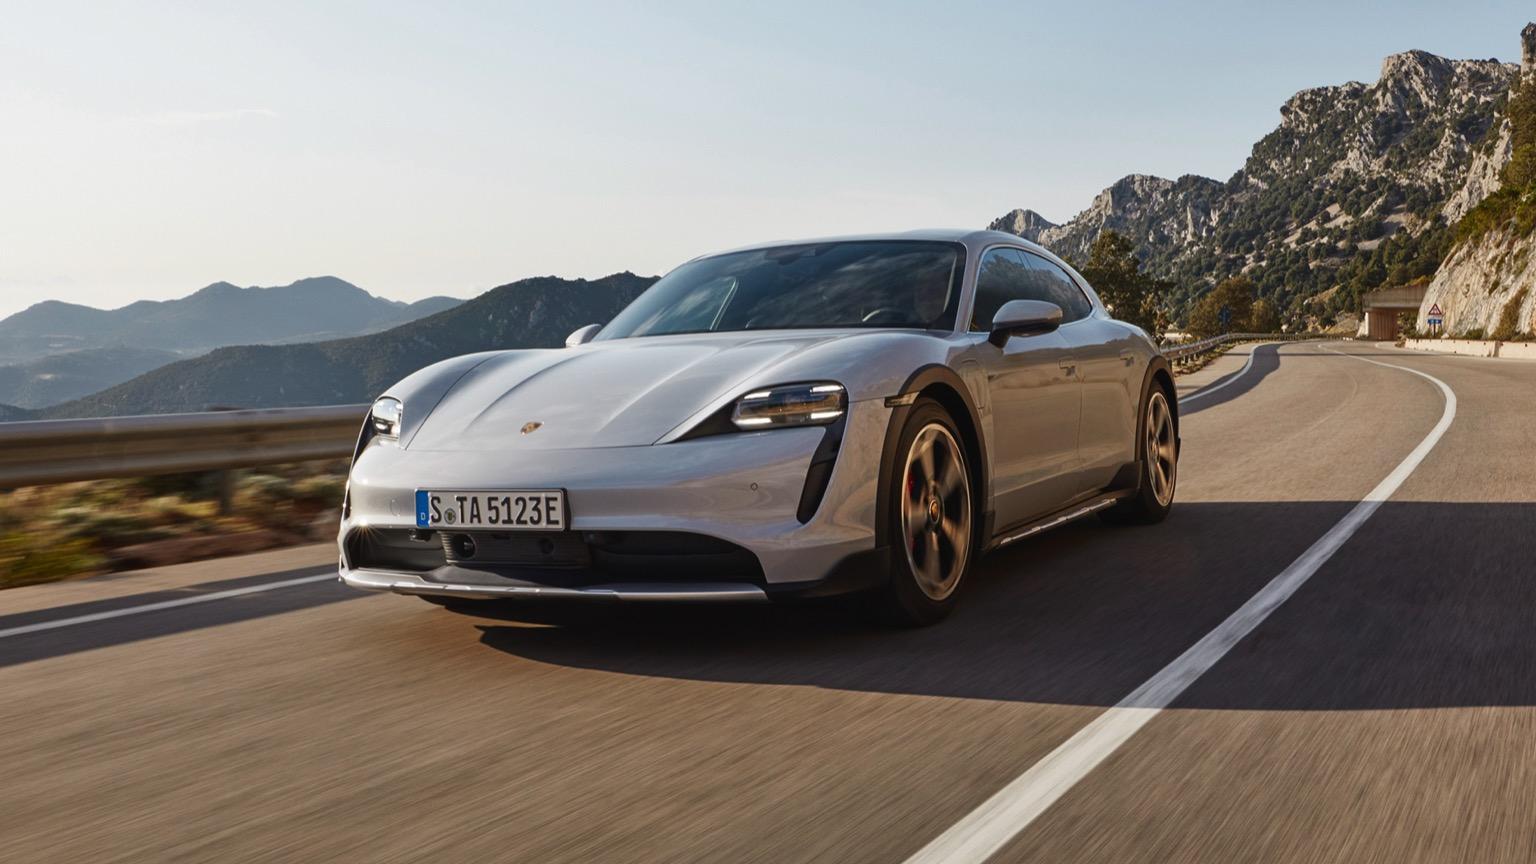 Porsche Taycan 4S Cross Turismo (2021)